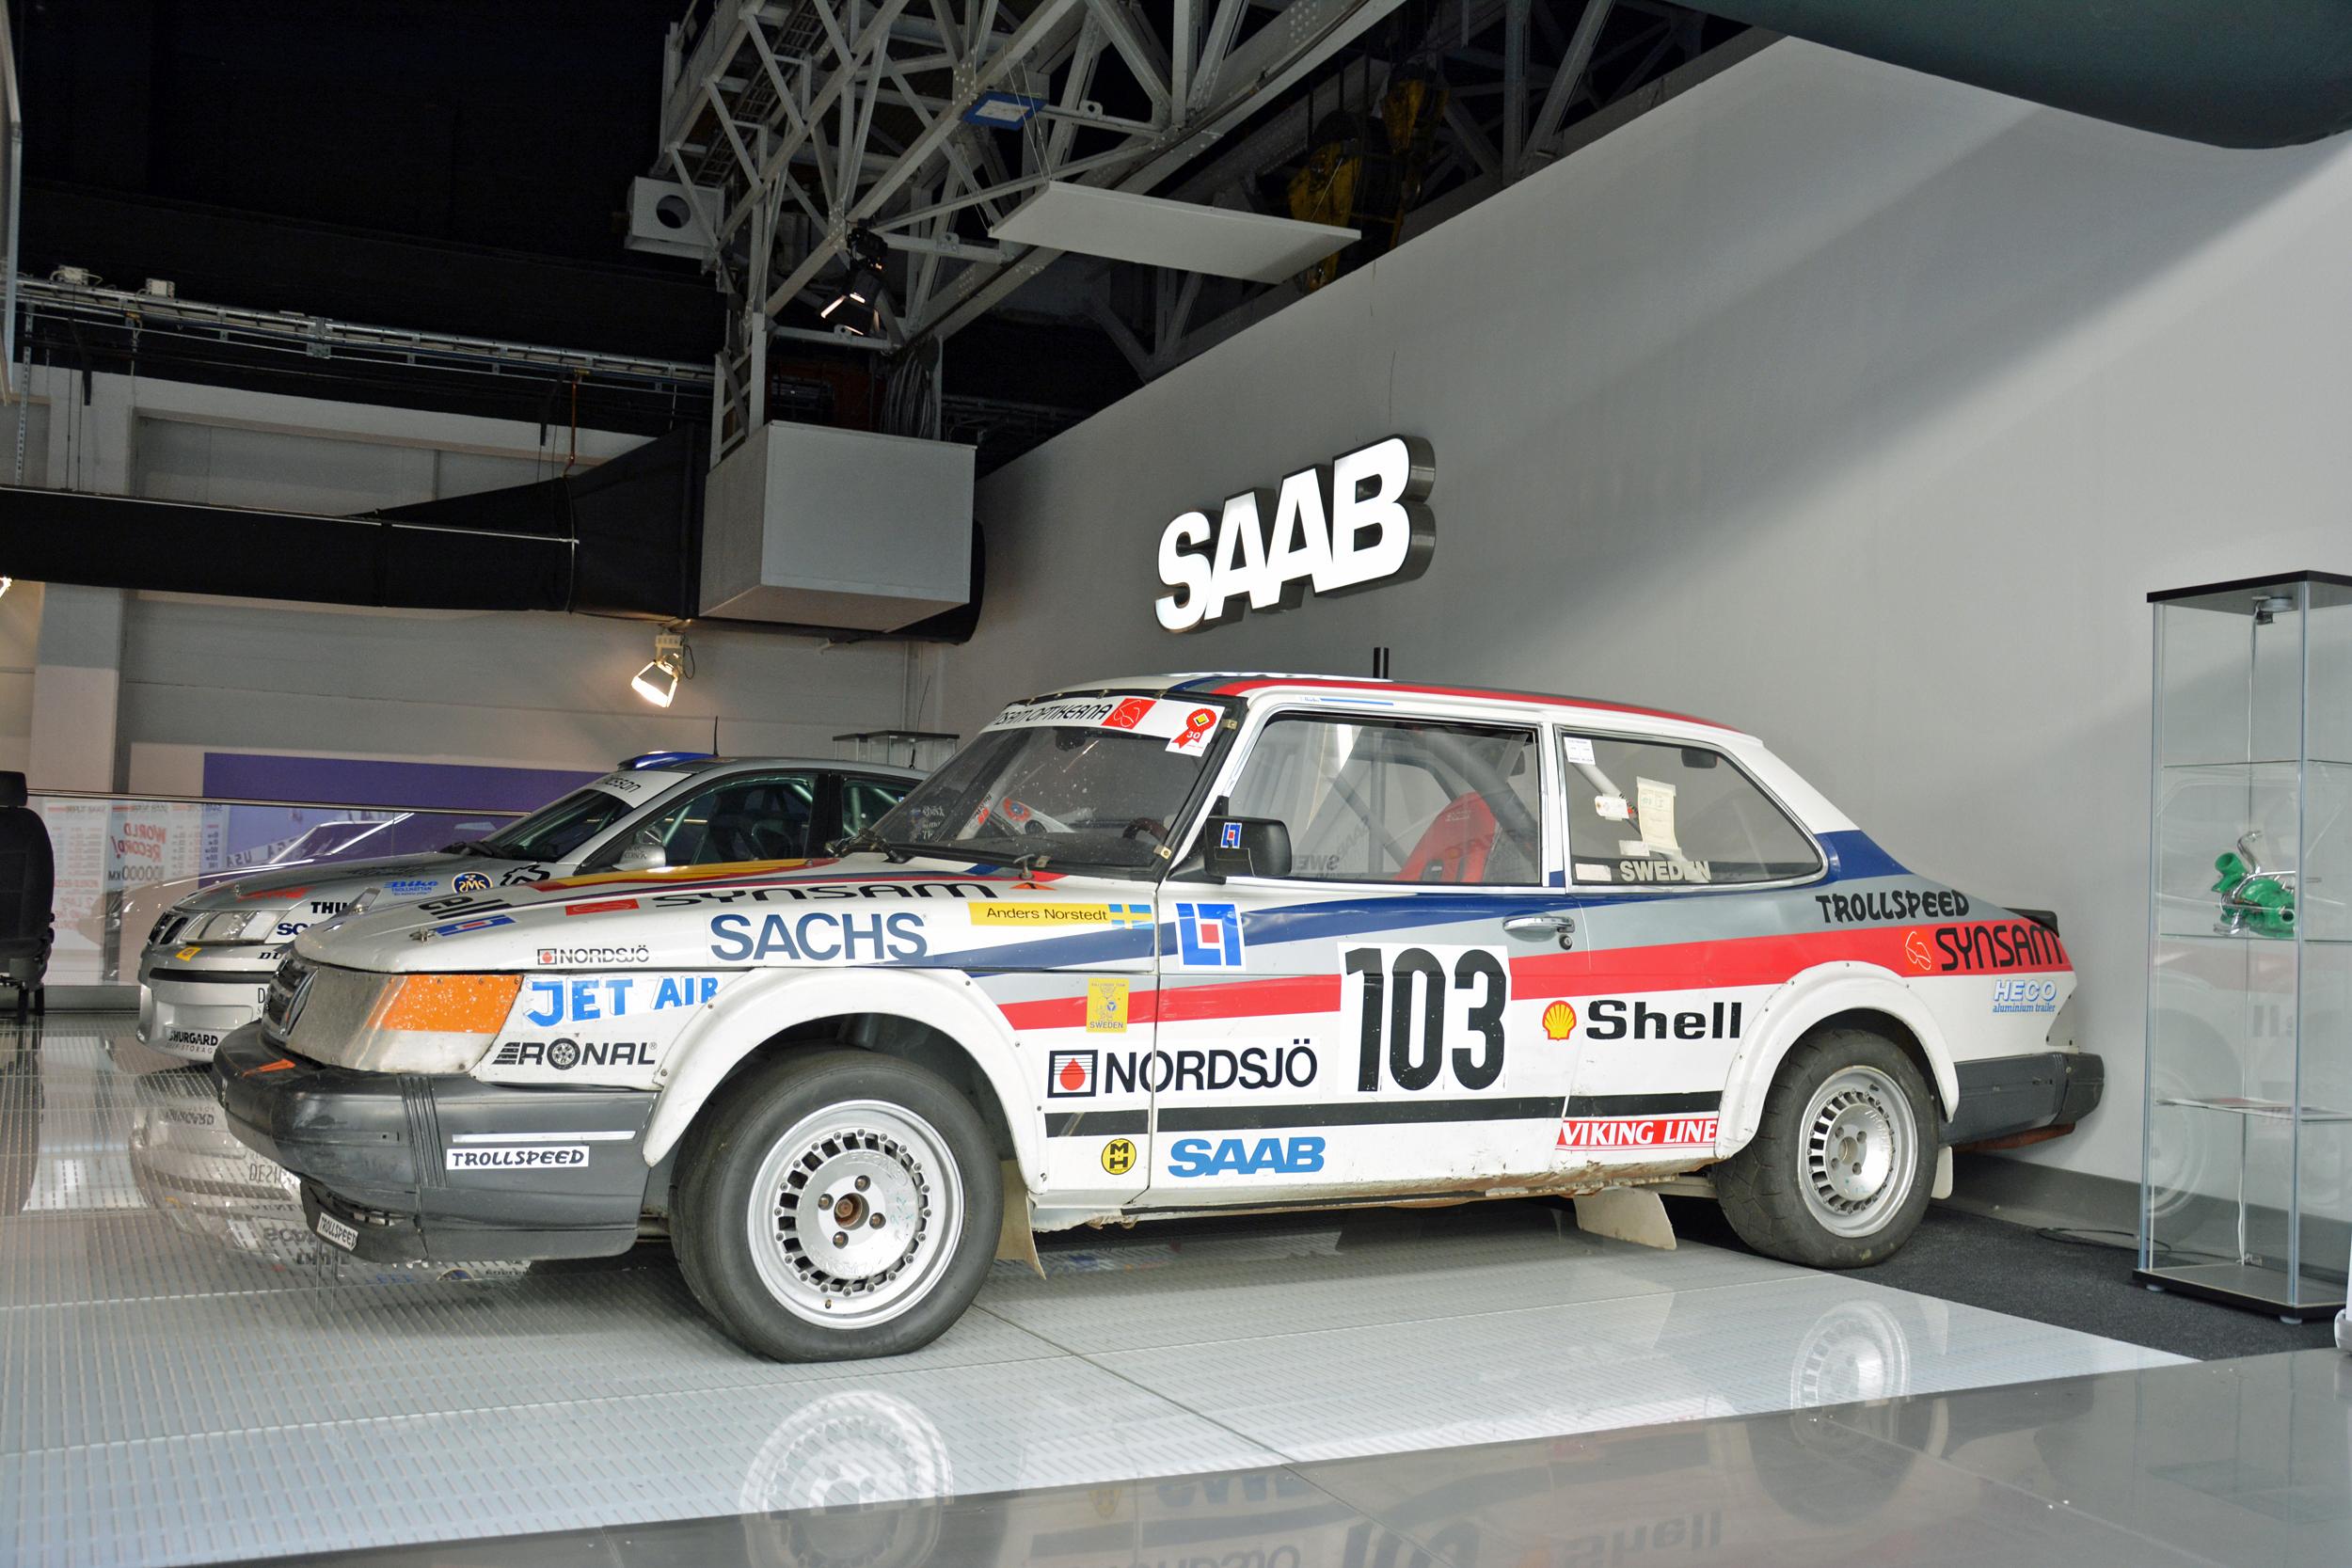 saab museum 900 t16 rallycross